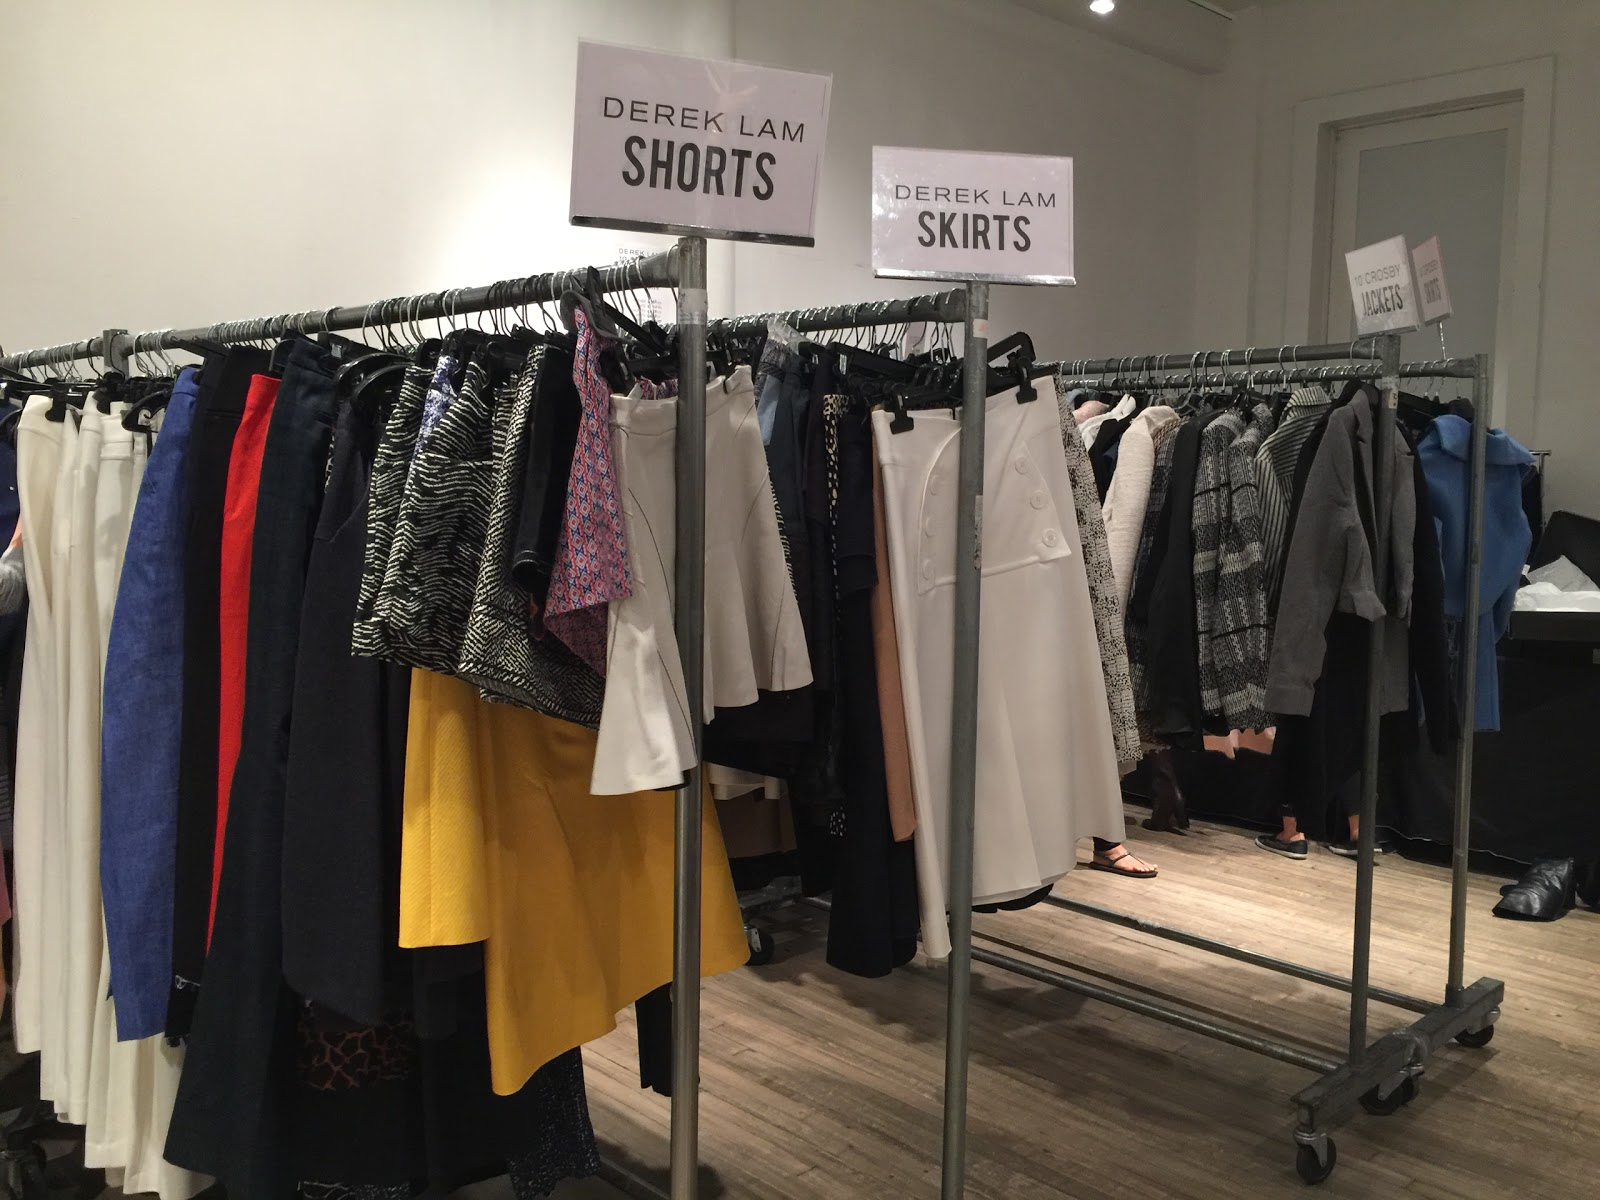 Derek Lam Final Discounts Bring Savings Well Over 90% Off Retail